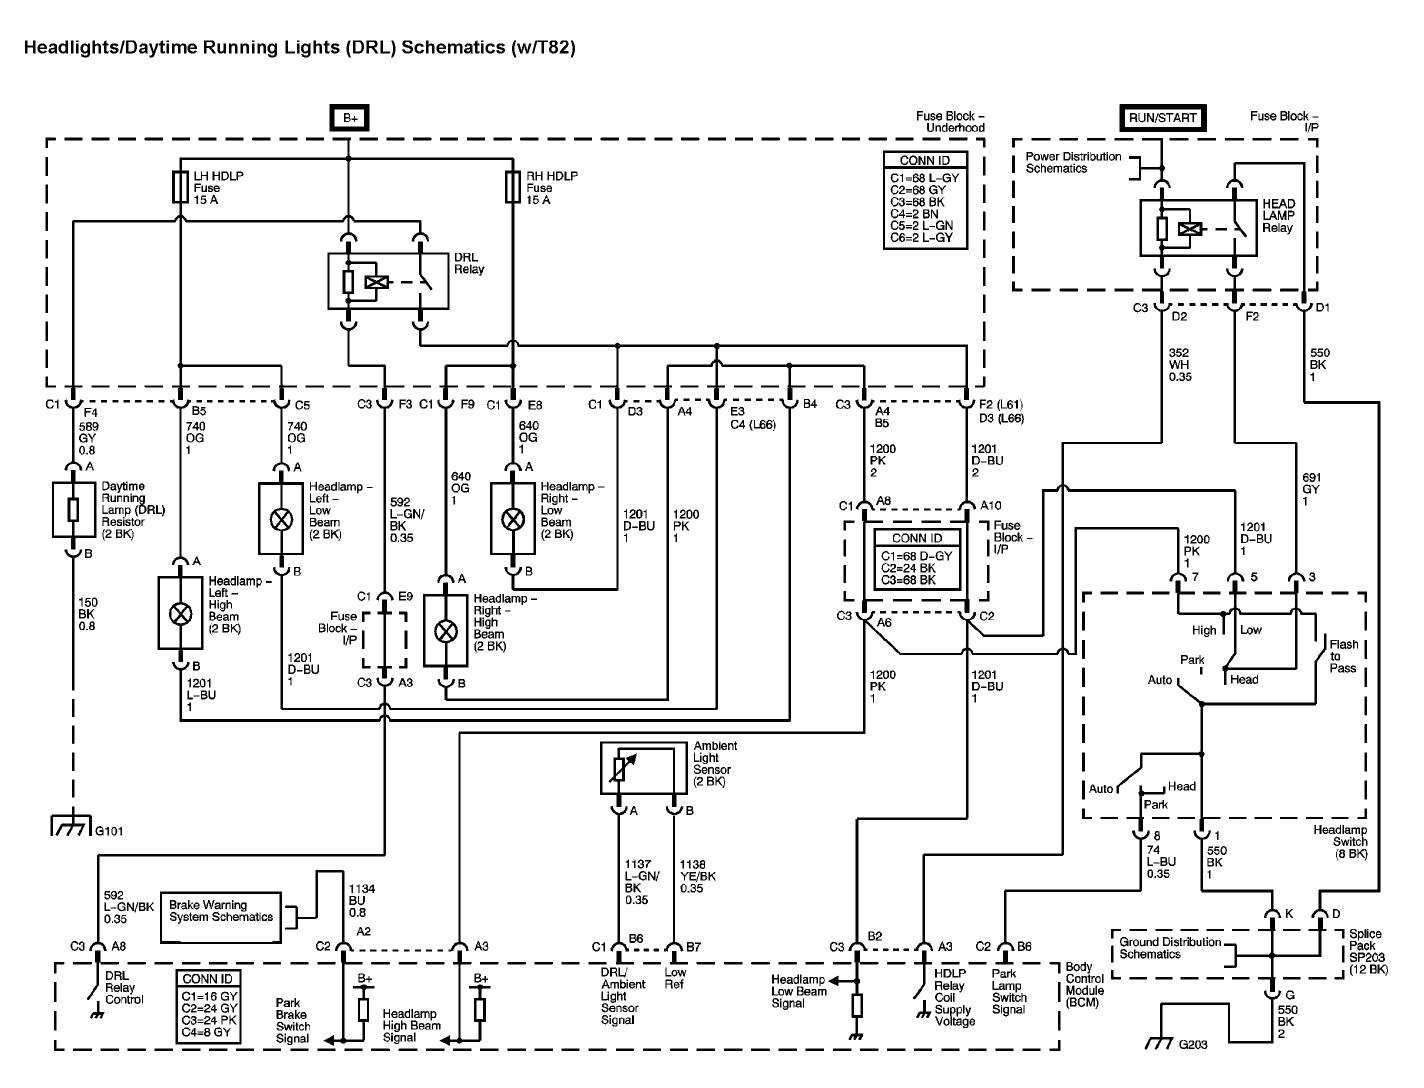 saturn lights wiring diagram wiring diagram fascinating saturn lights wiring diagram